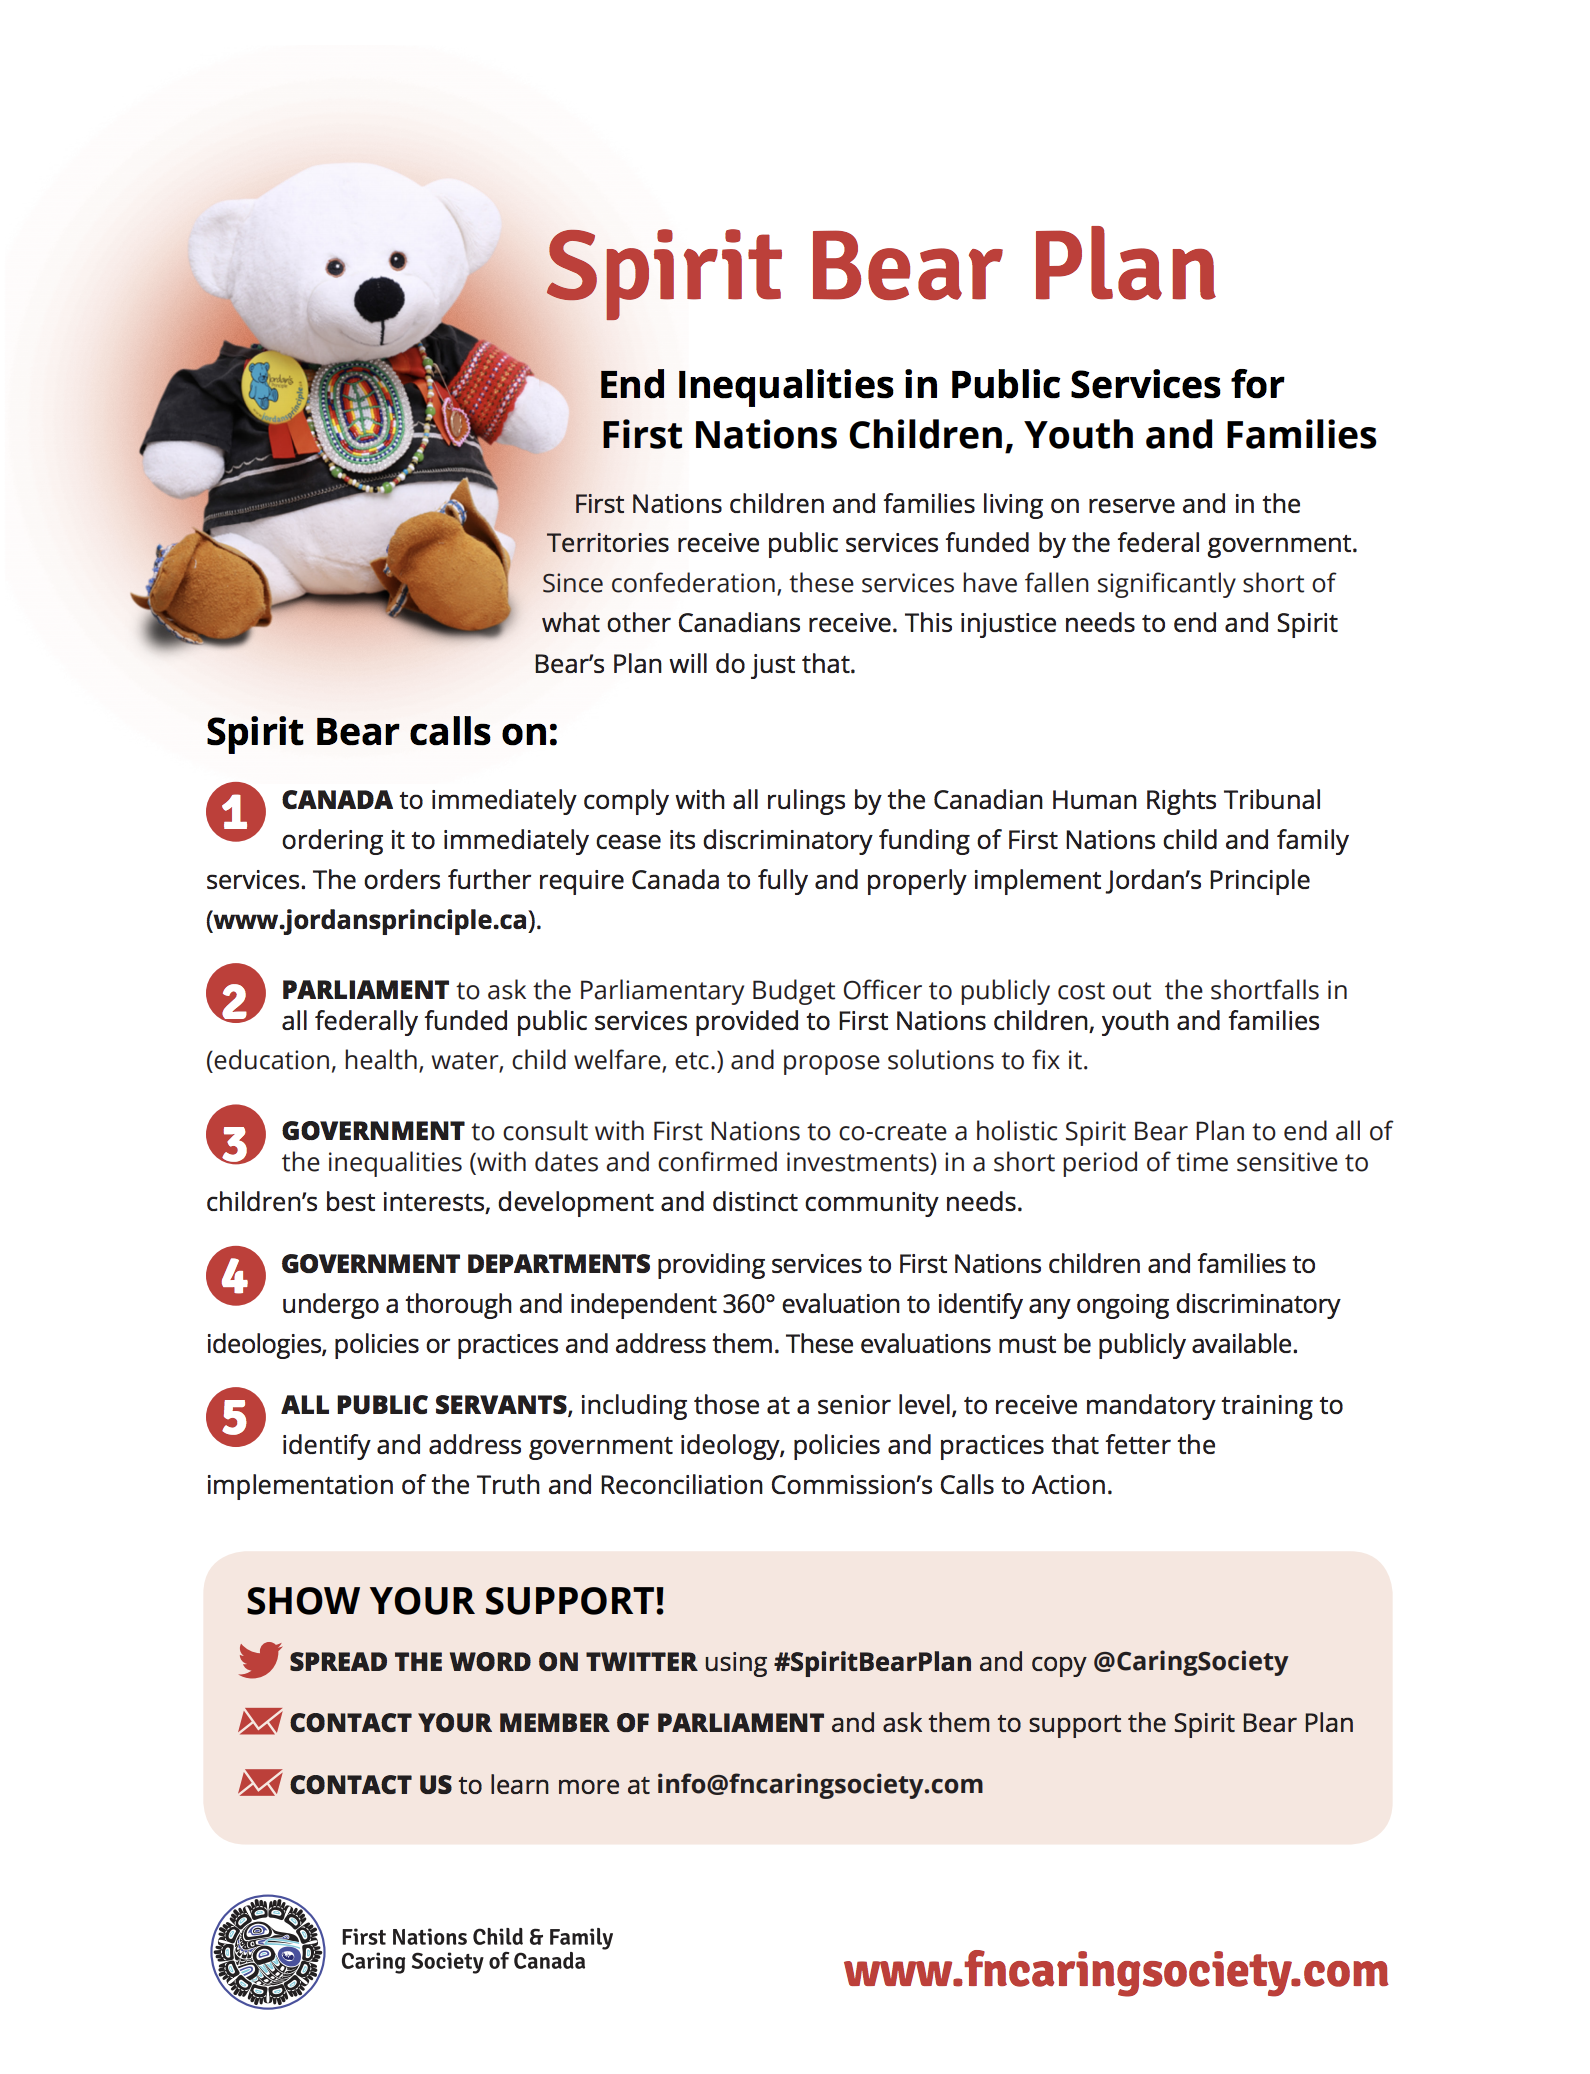 Spirit Bear Plan   The Caring Society